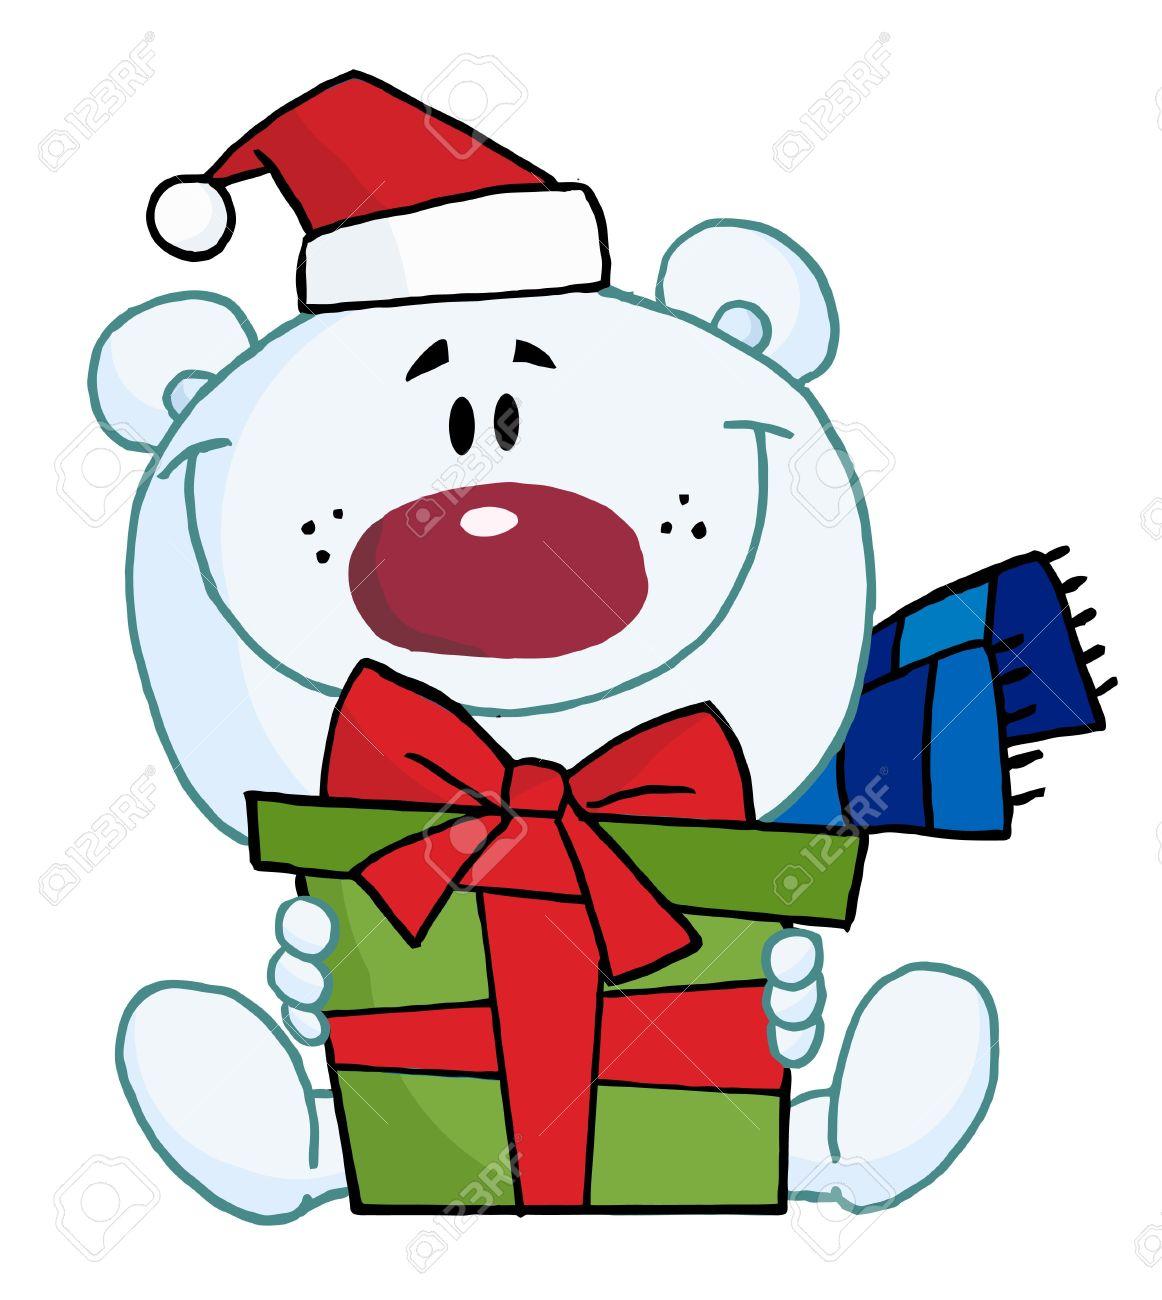 1162x1300 Bear Christmas Clipart, Explore Pictures